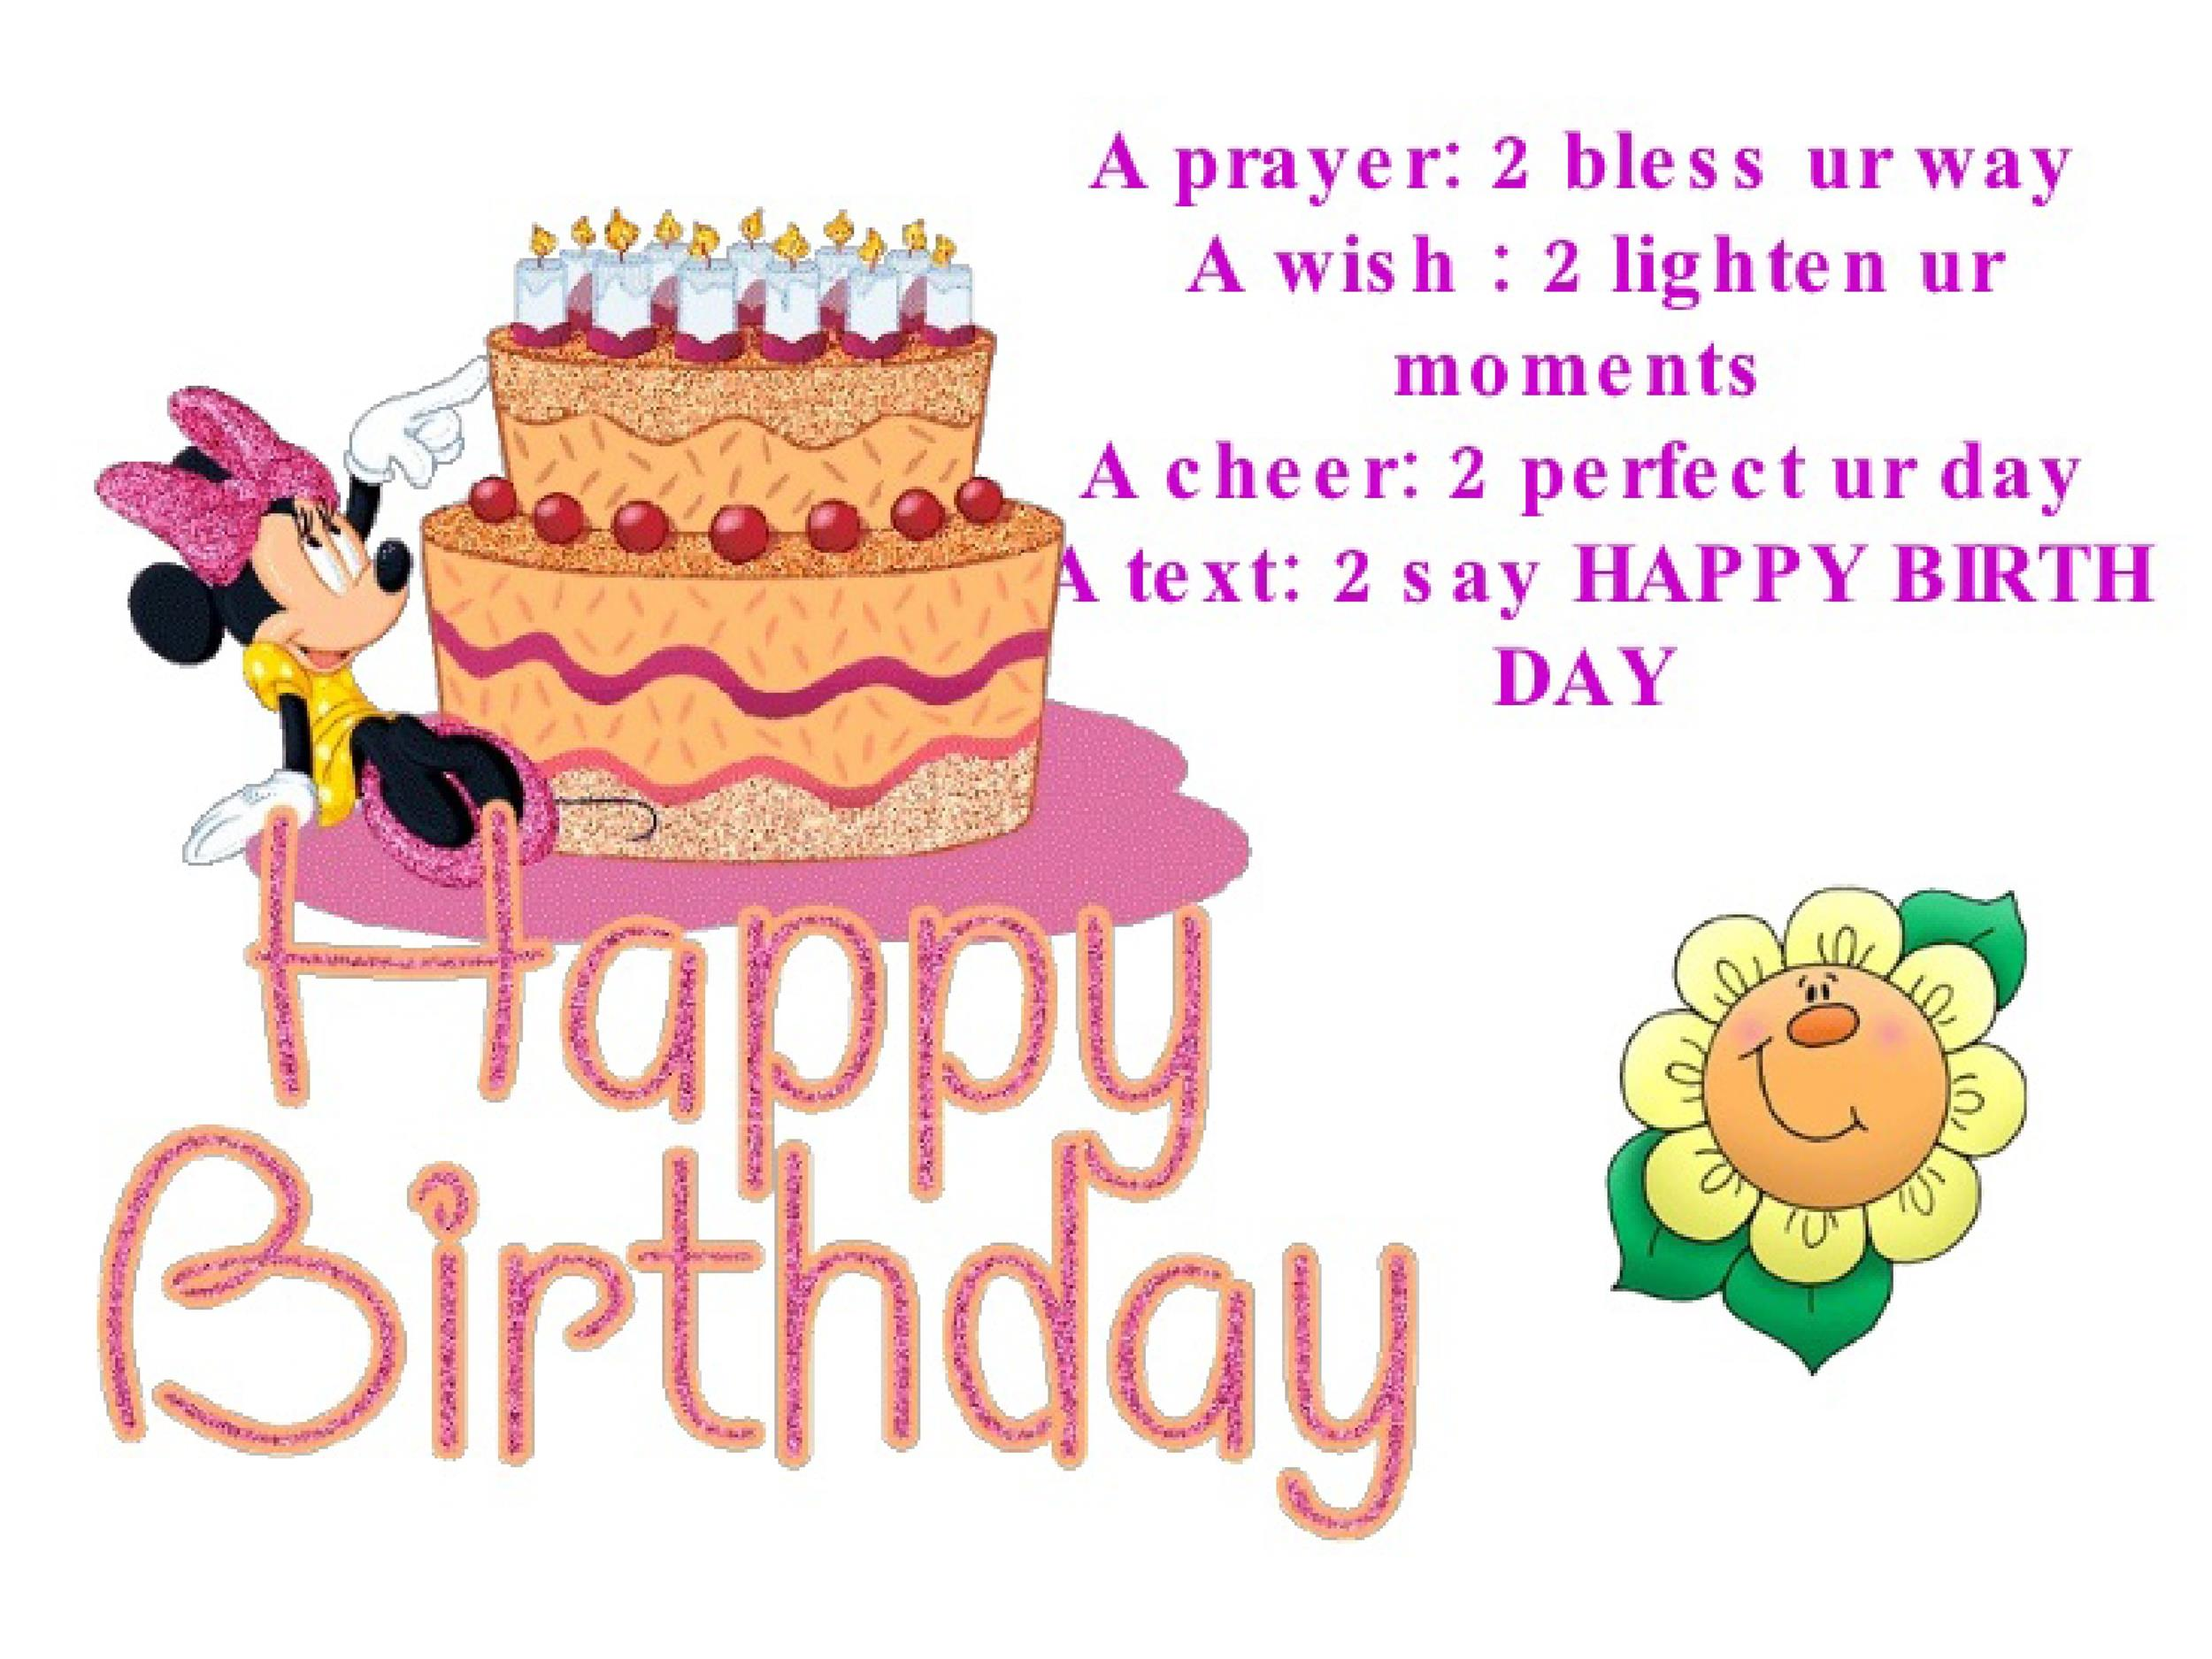 40+ FREE Birthday Card Templates ᐅ Template Lab